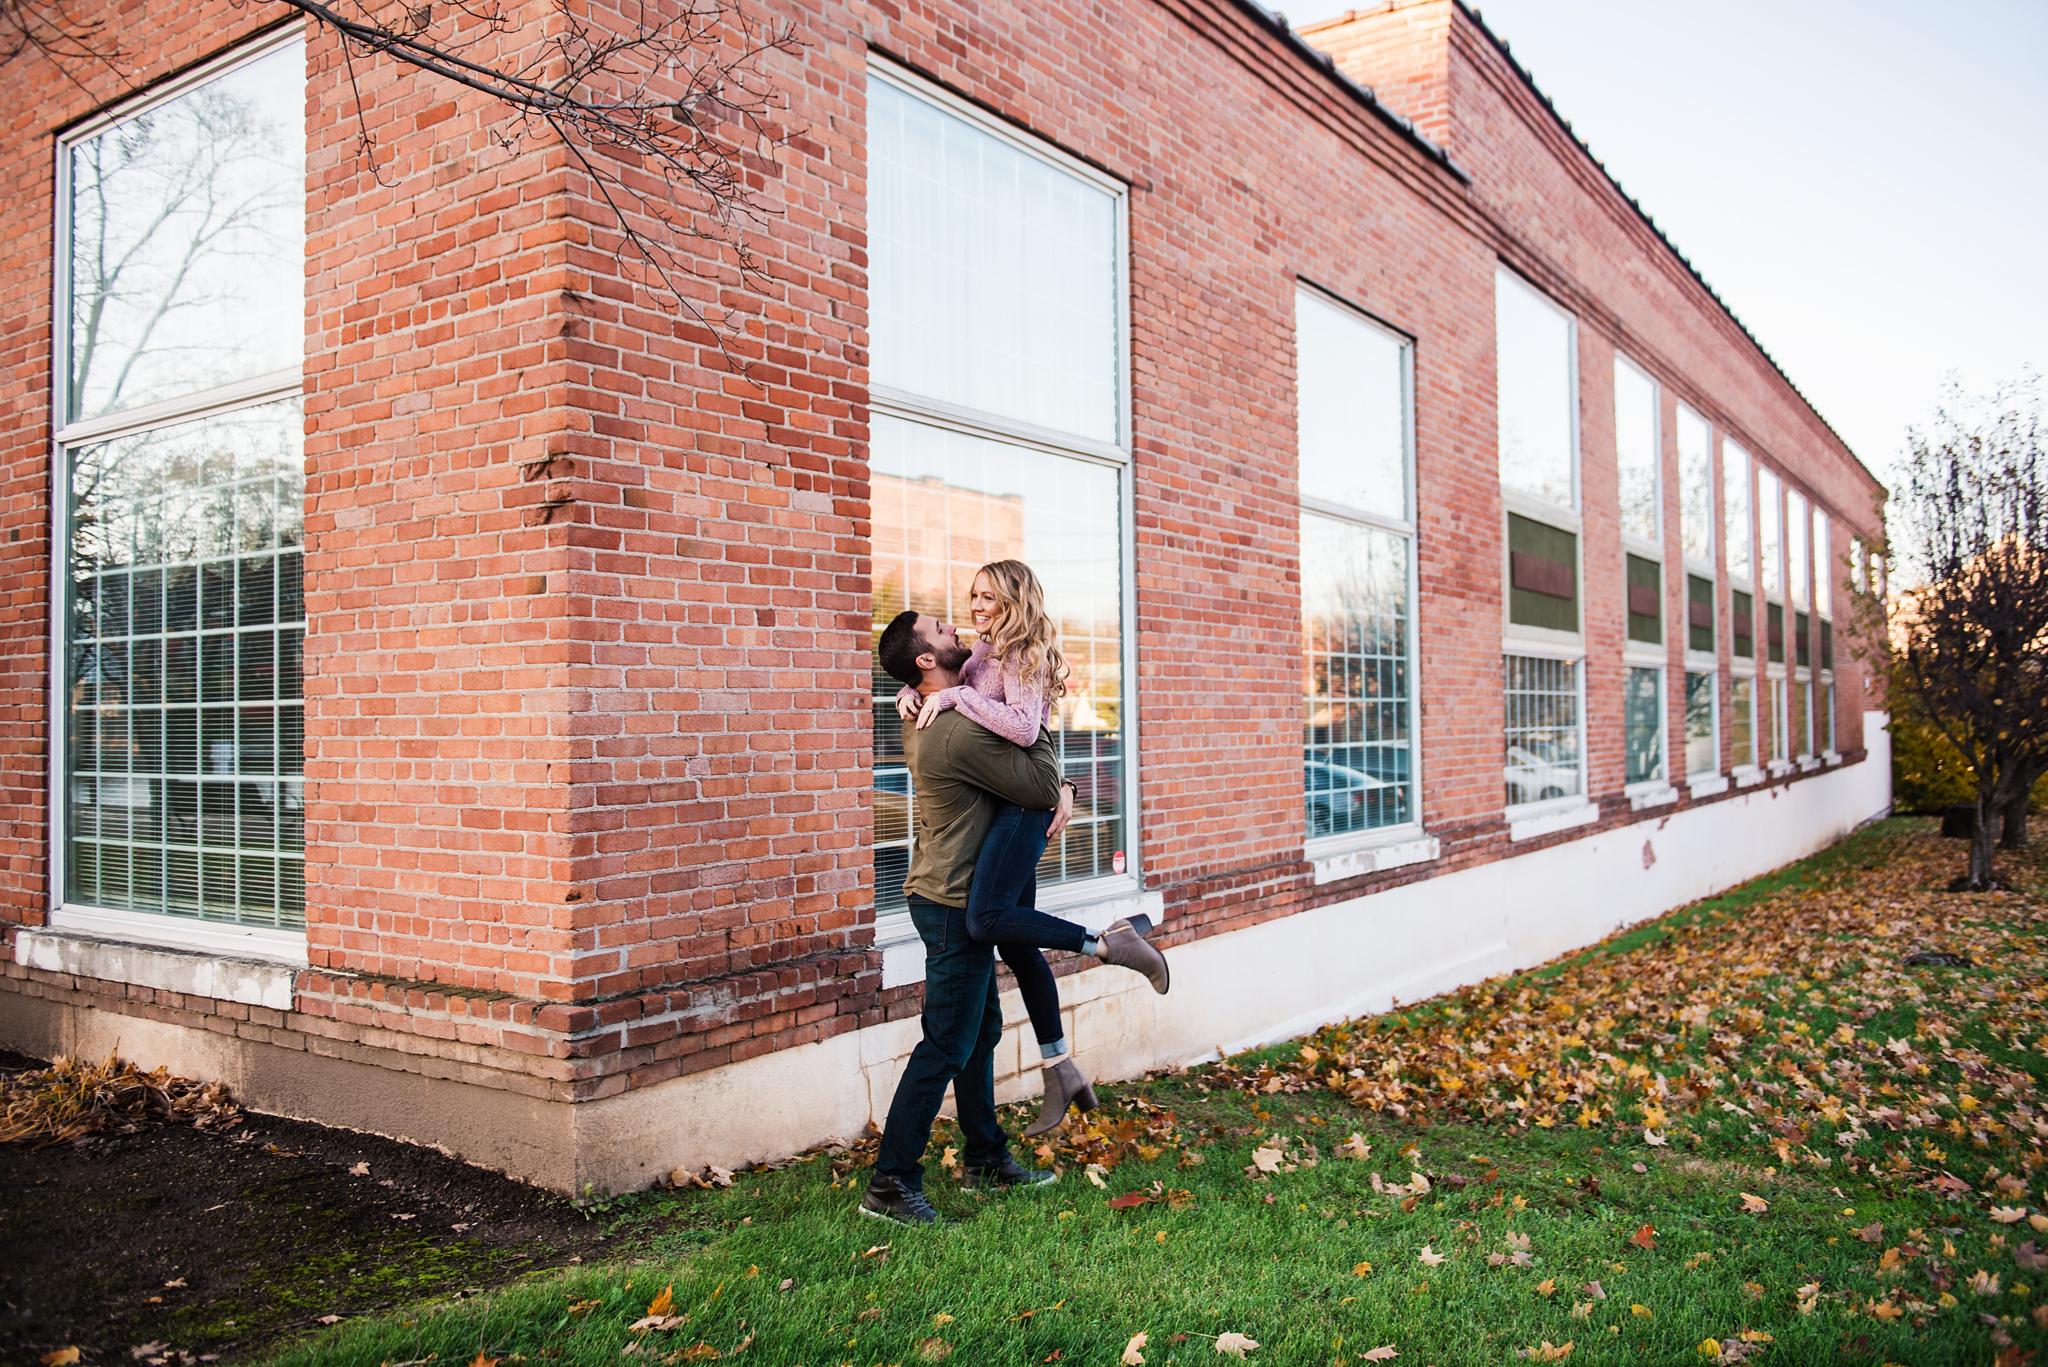 Village_of_Fairport_Rochester_Engagement_Session_JILL_STUDIO_Rochester_NY_Photographer_DSC_8645.jpg